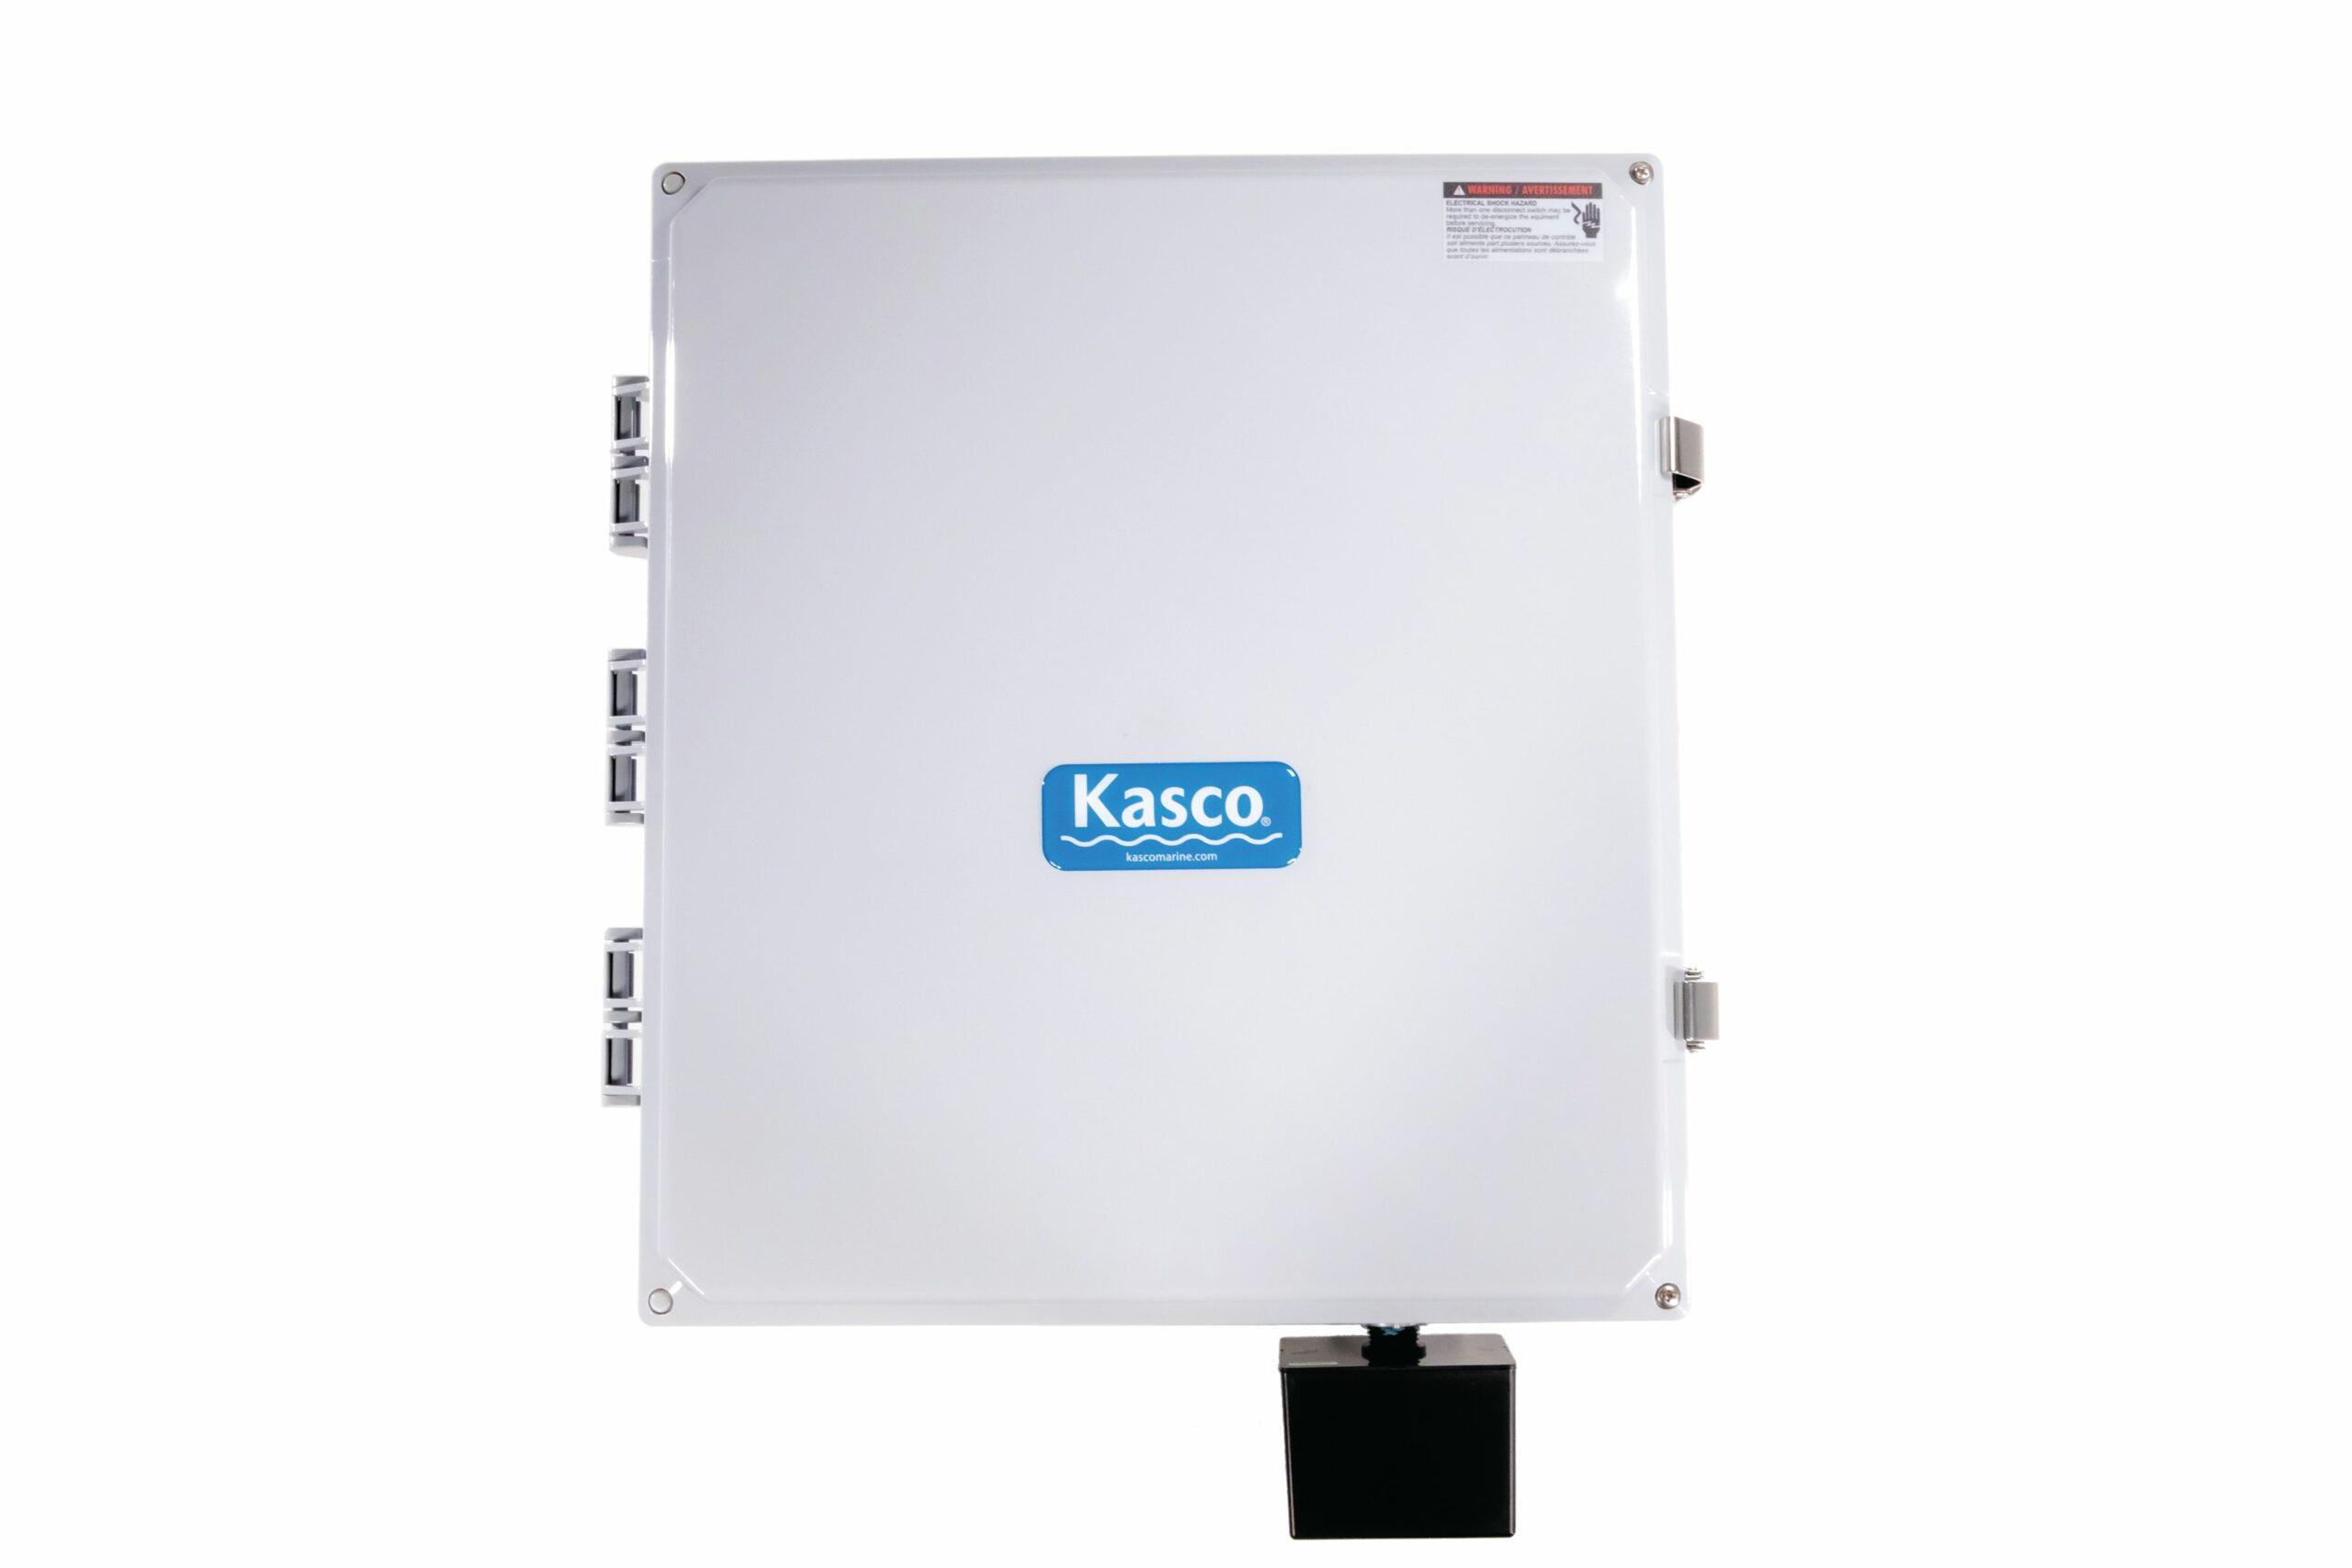 CF-3235 30A/240V Control Panel for 2, 3 & 5 HP Kasco Fountains, Circulators & Surface Aerators